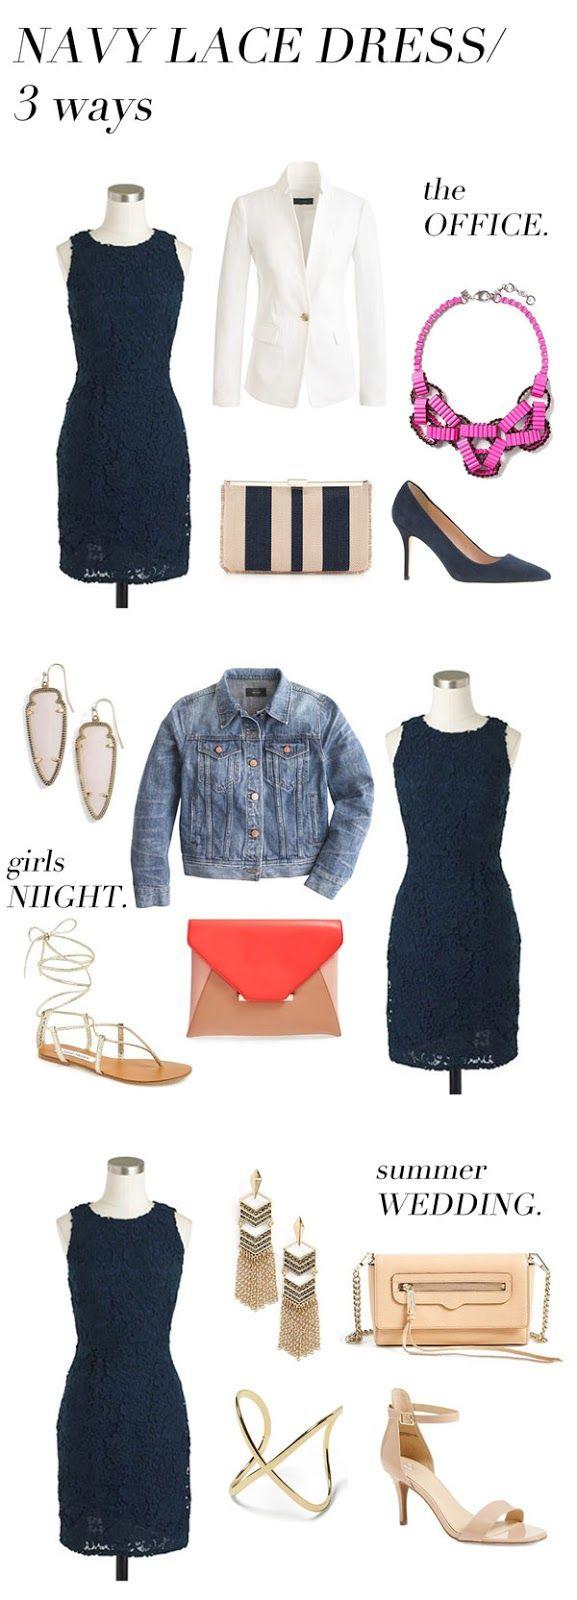 navy lace dress… 3 ways!